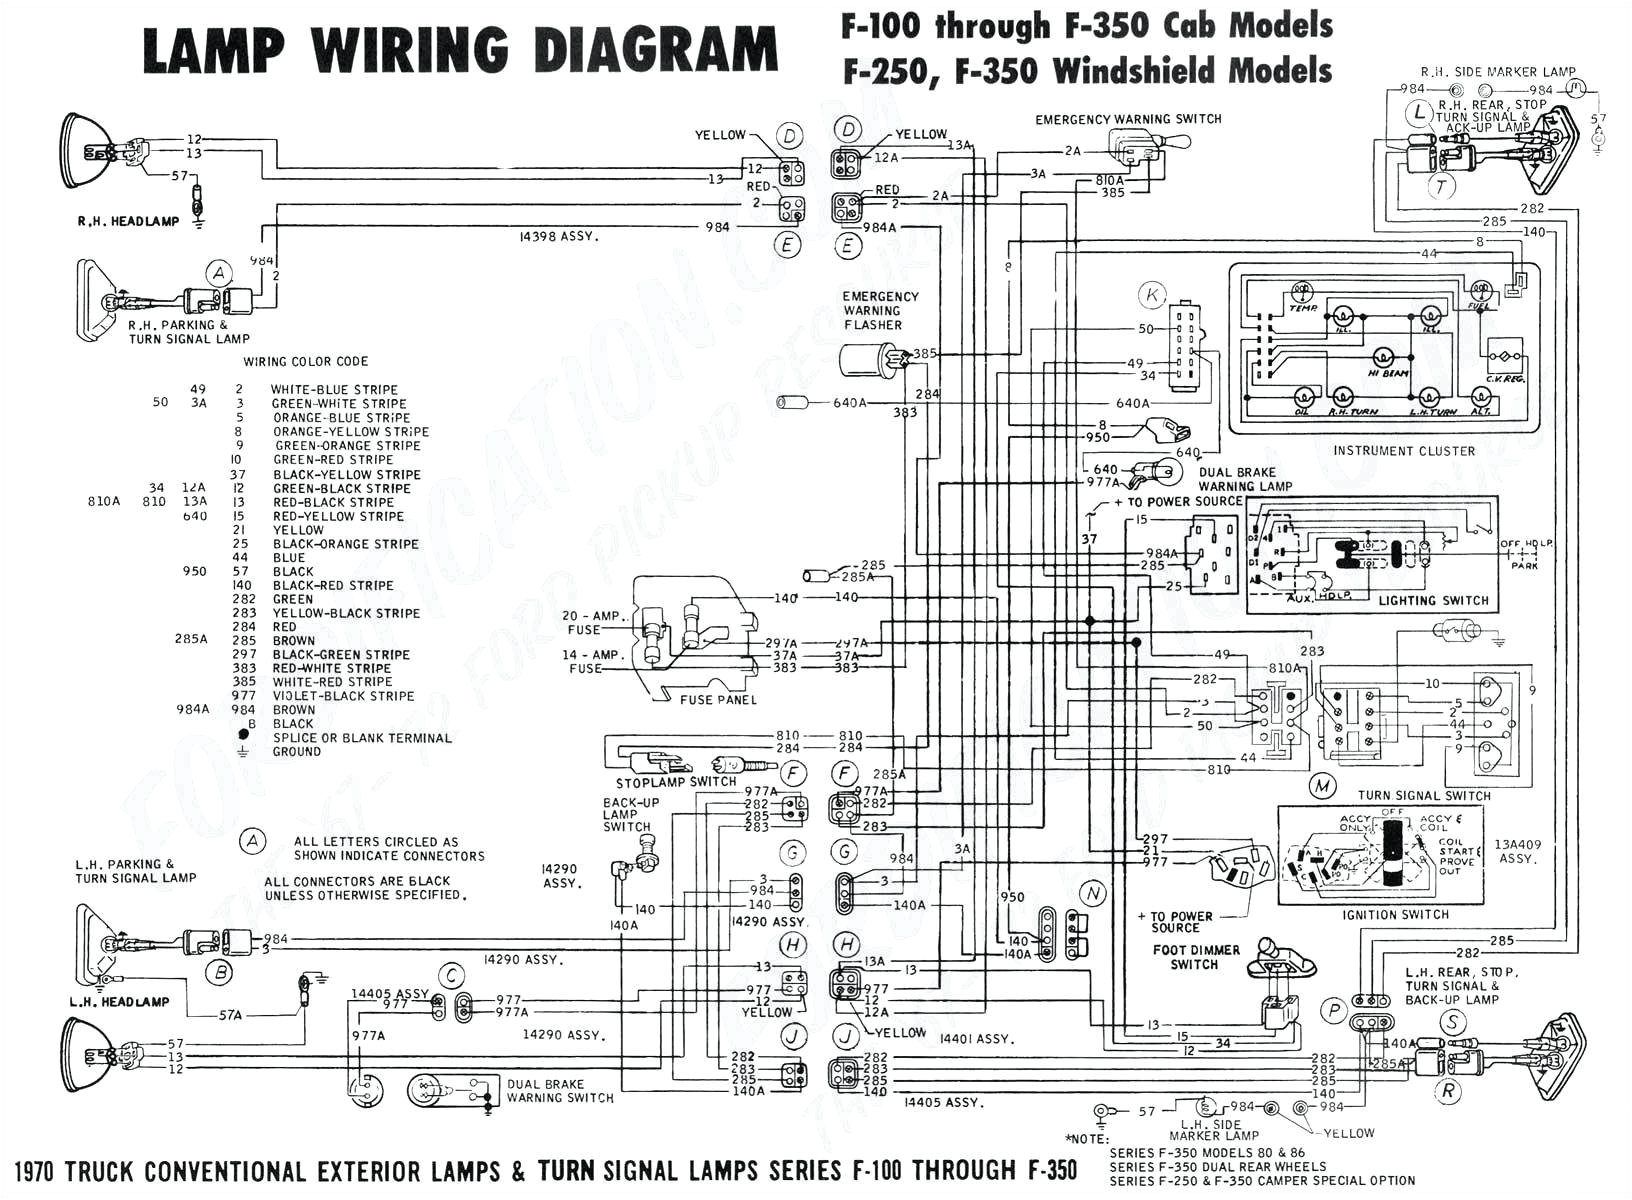 Ford Radio Wiring Harness Diagram ford Radio Wiring Harness Connectors 18c815 Be for Yl2f Wiring